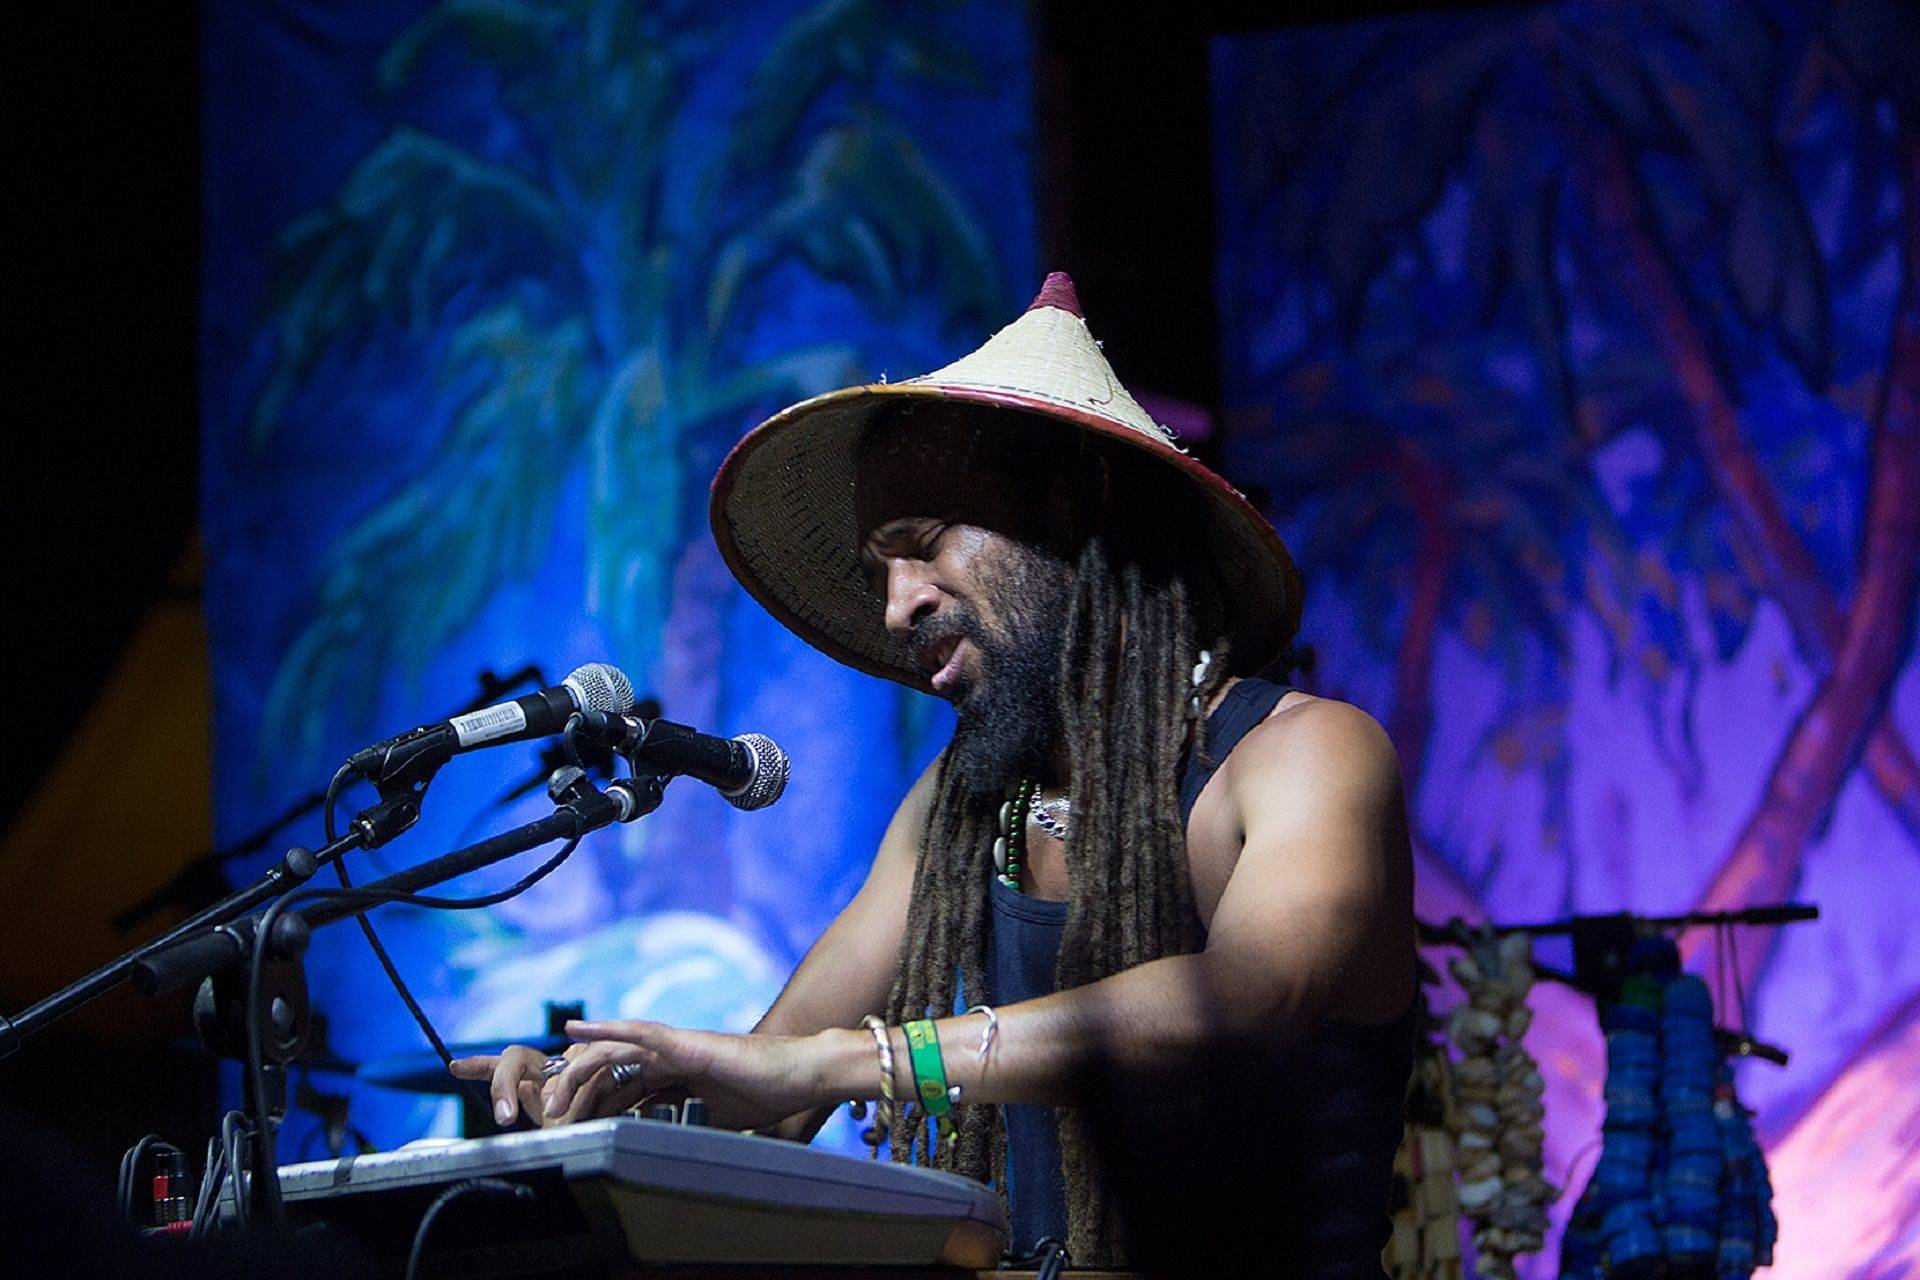 Kumar Sublevao Beat. Photo: Ronald Salazar (Courtesy of the artist)